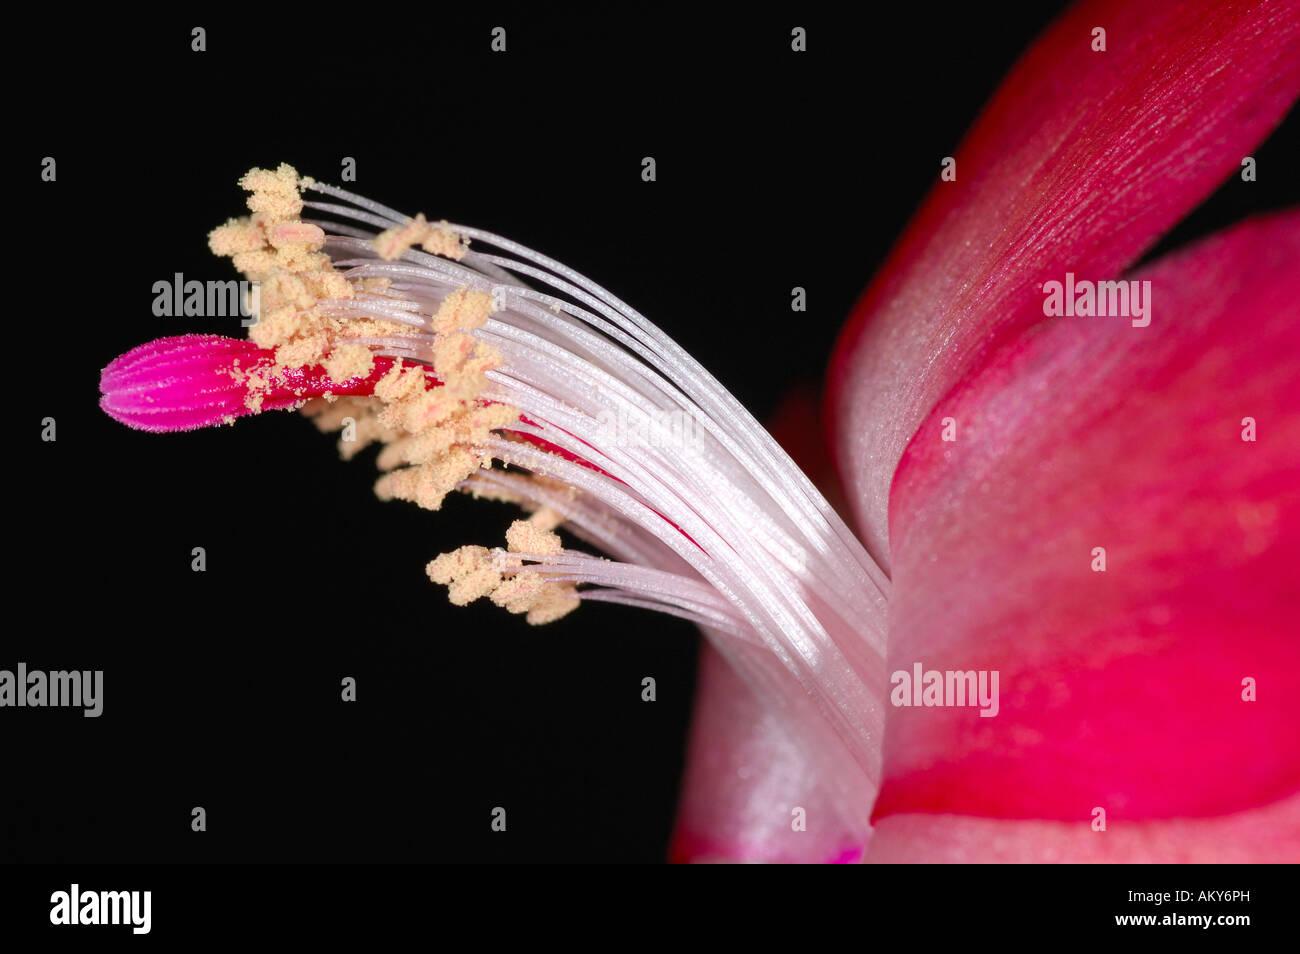 Detail of the flower of Christmas Cactus, Schlumbergera truncata - Stock Image